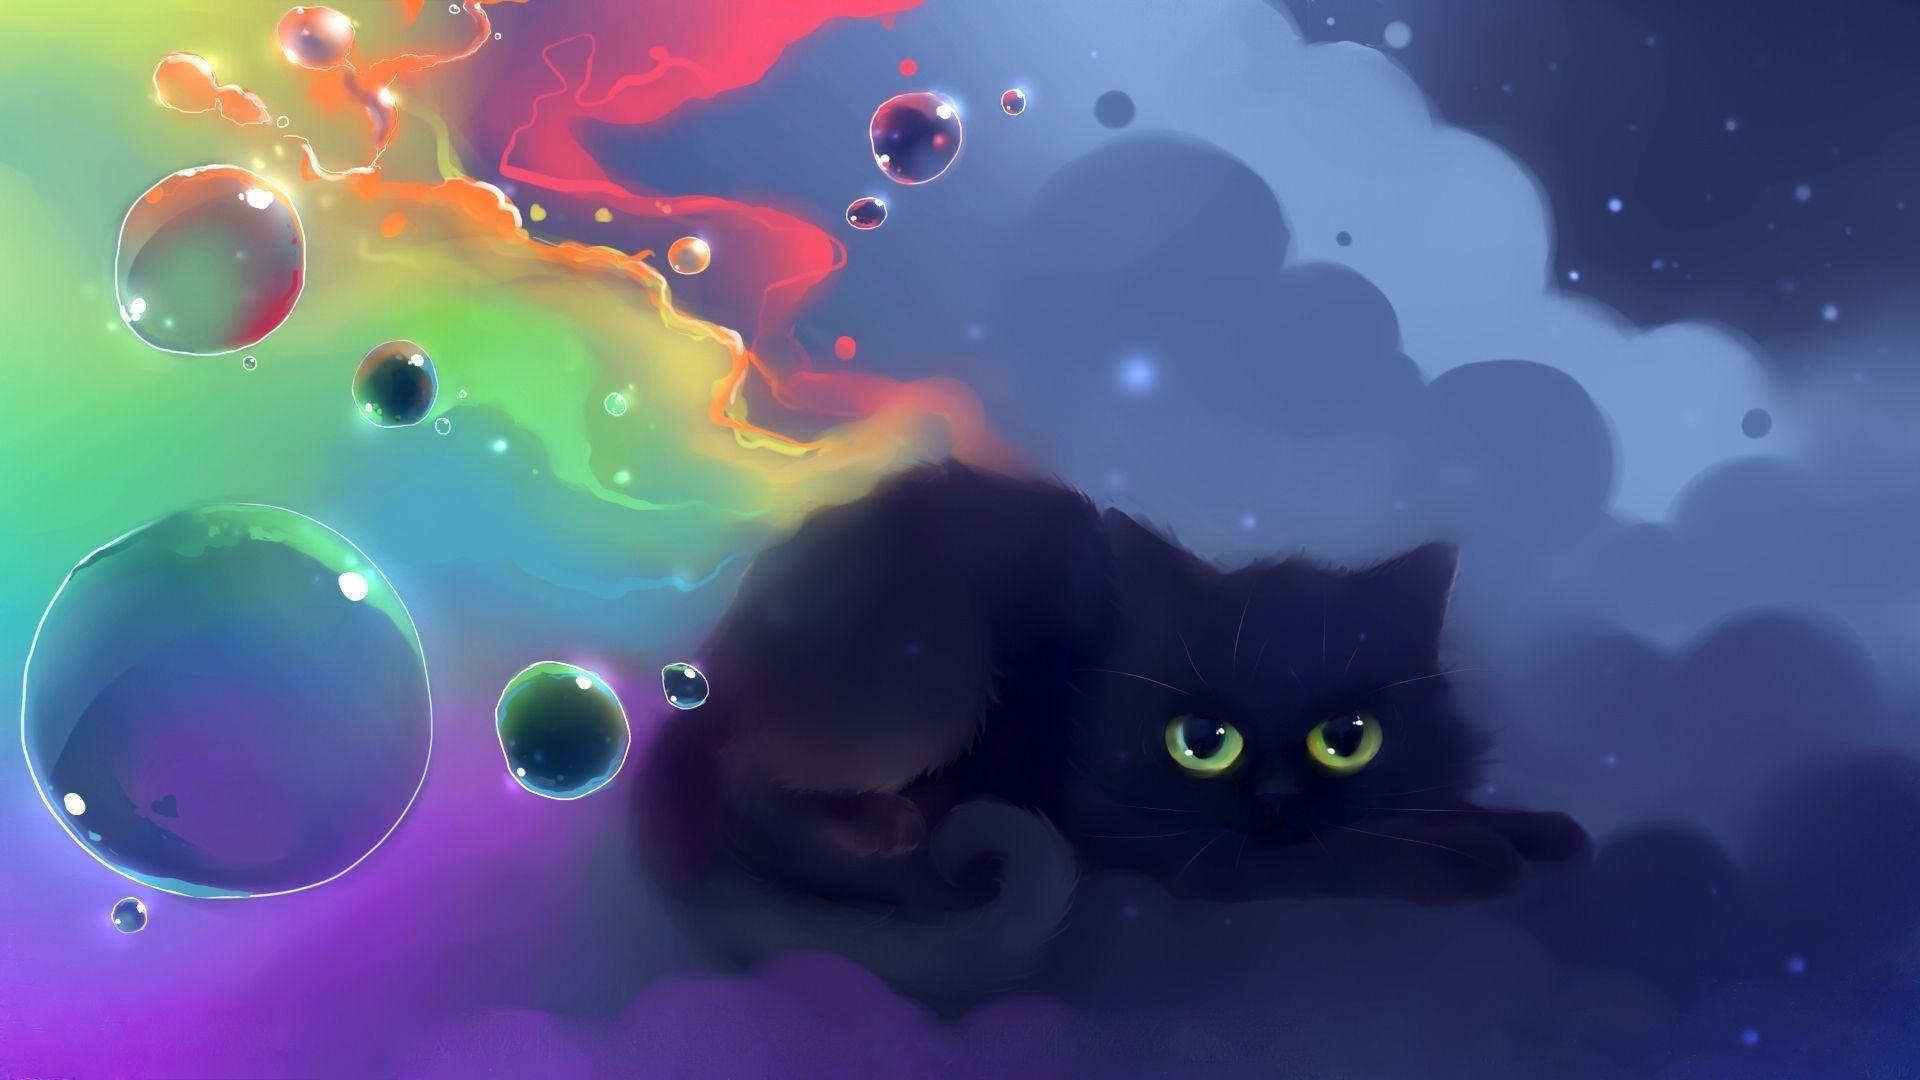 1920x1200 black cat halloween wallpaper pc. Kawaii Black Cat Halloween Wallpapers Wallpaper Cave